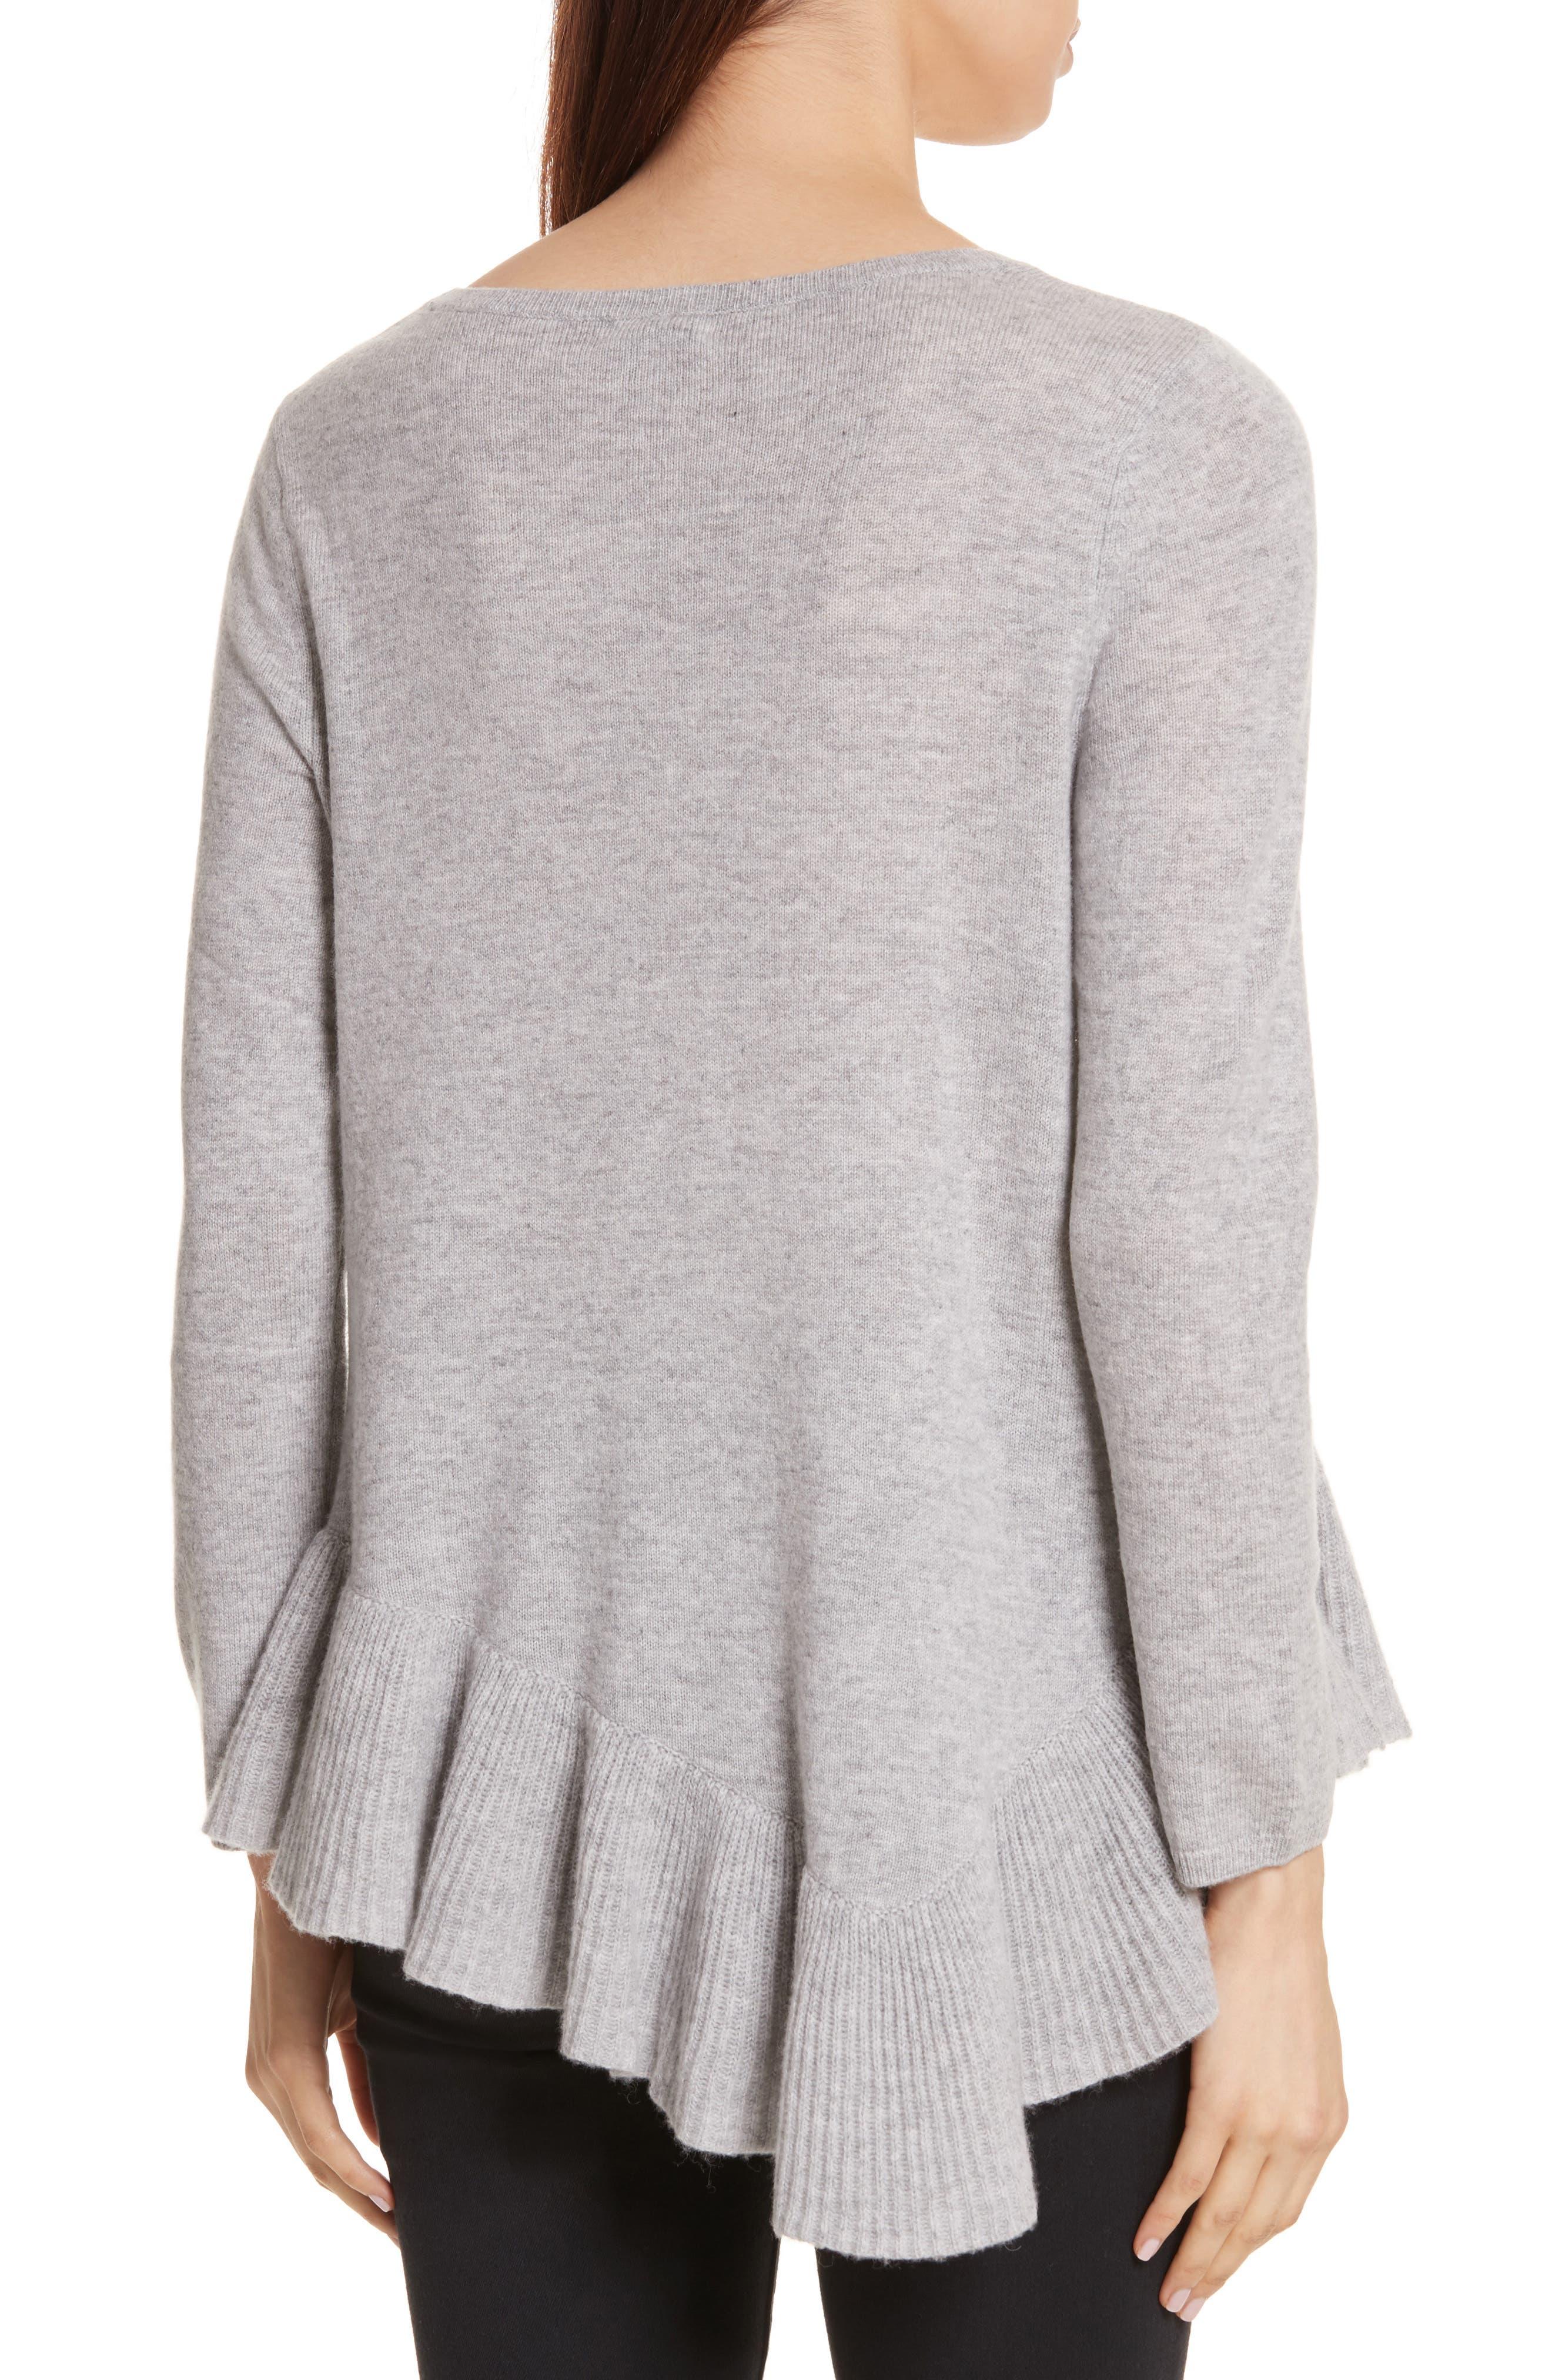 Alternate Image 2  - Joie Tambrel N Wool & Cashmere Asymmetrical Sweater Tunic